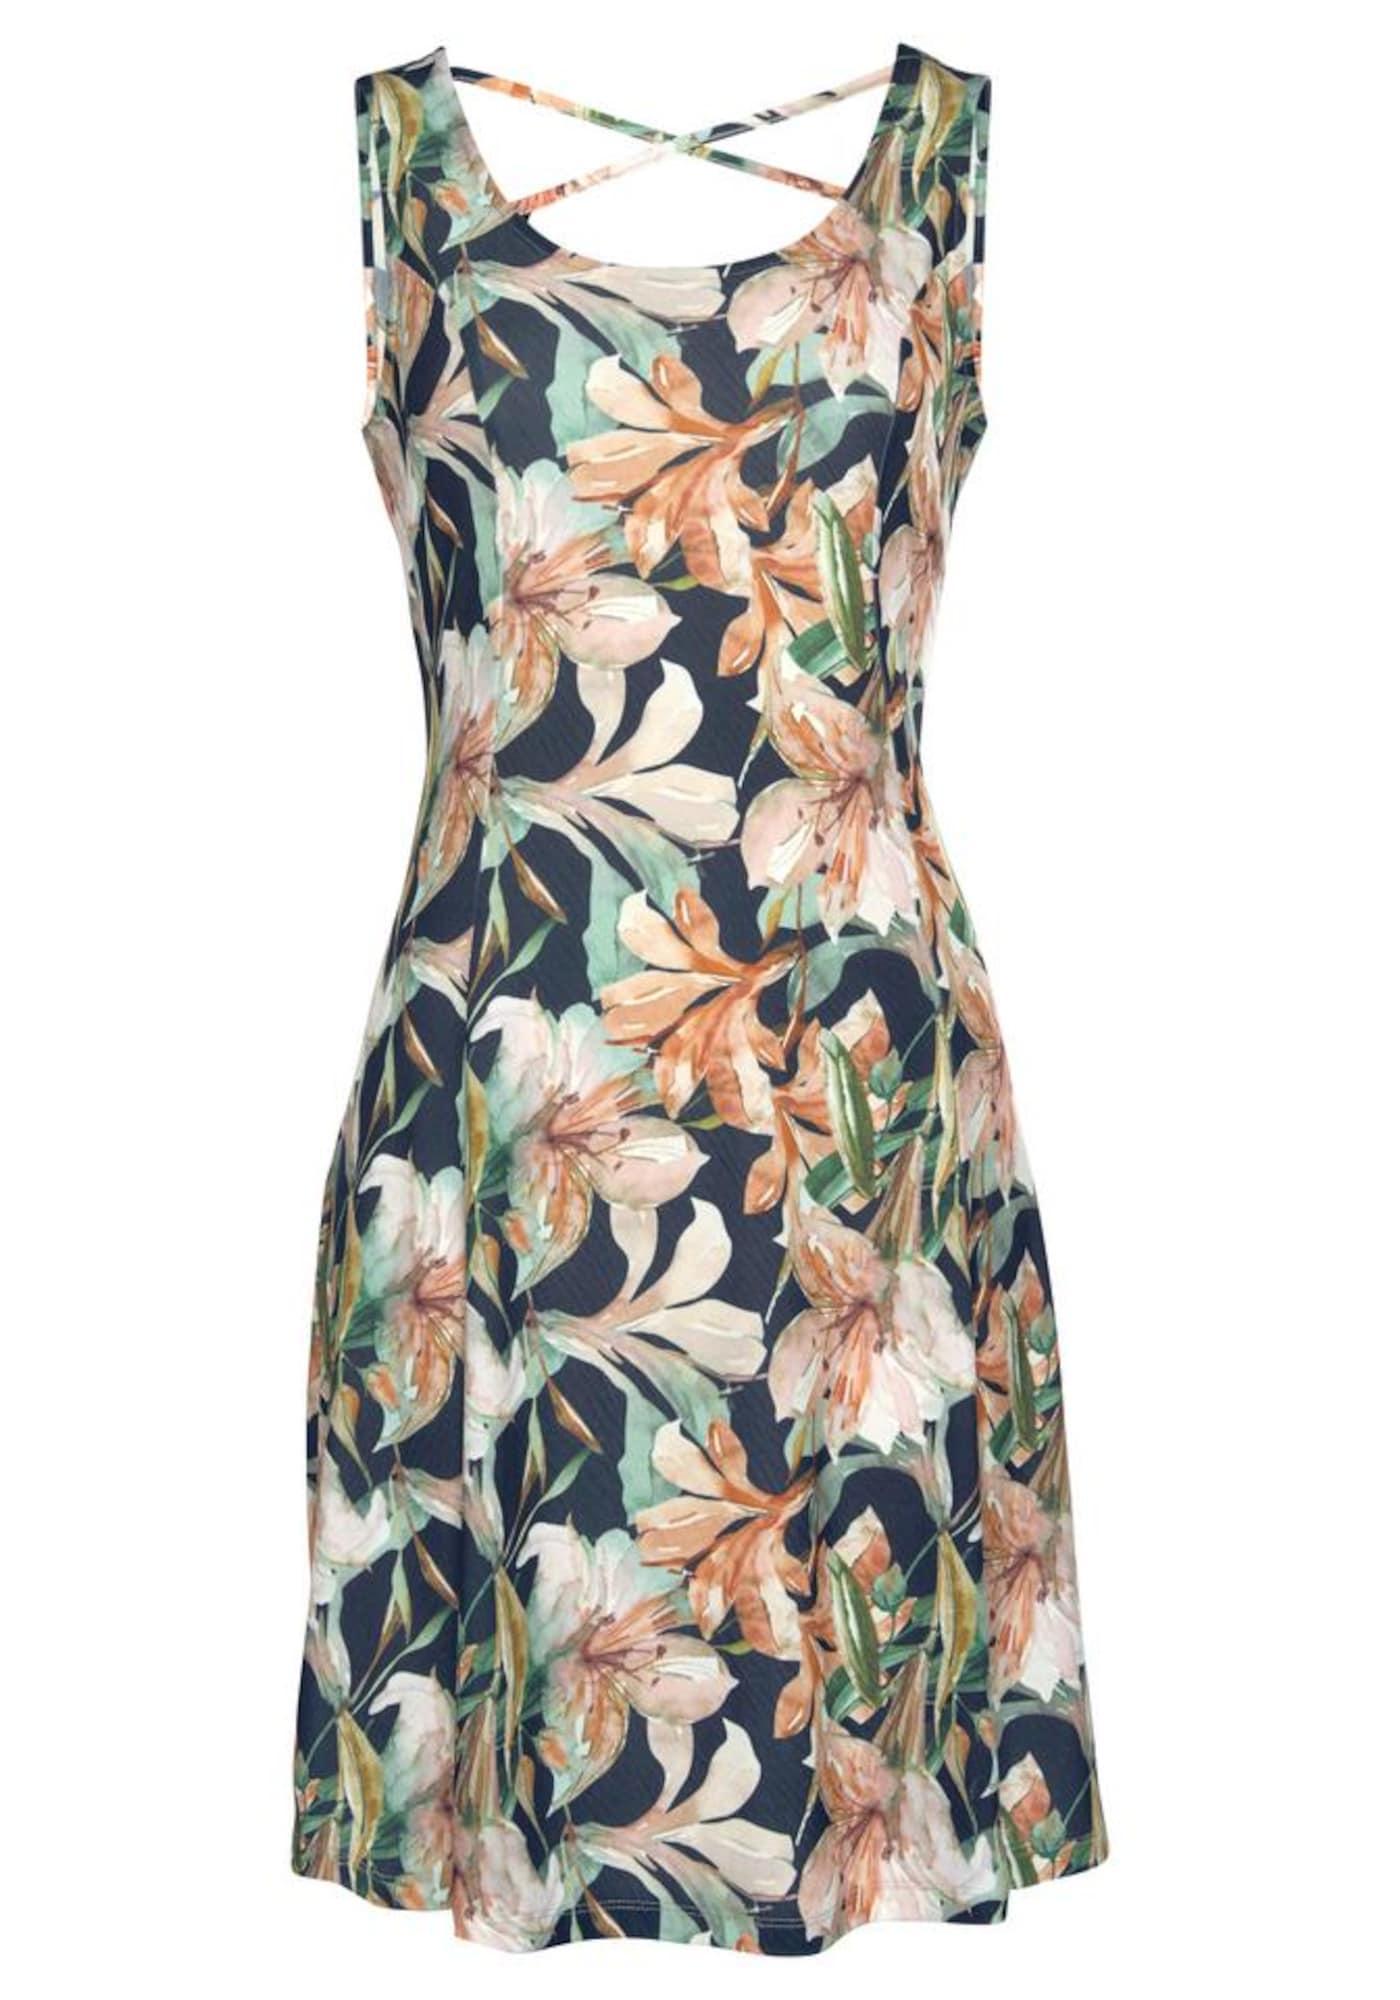 Strandkleid | Bekleidung > Kleider > Strandkleider | Pastellgrün - Rosa | Lascana